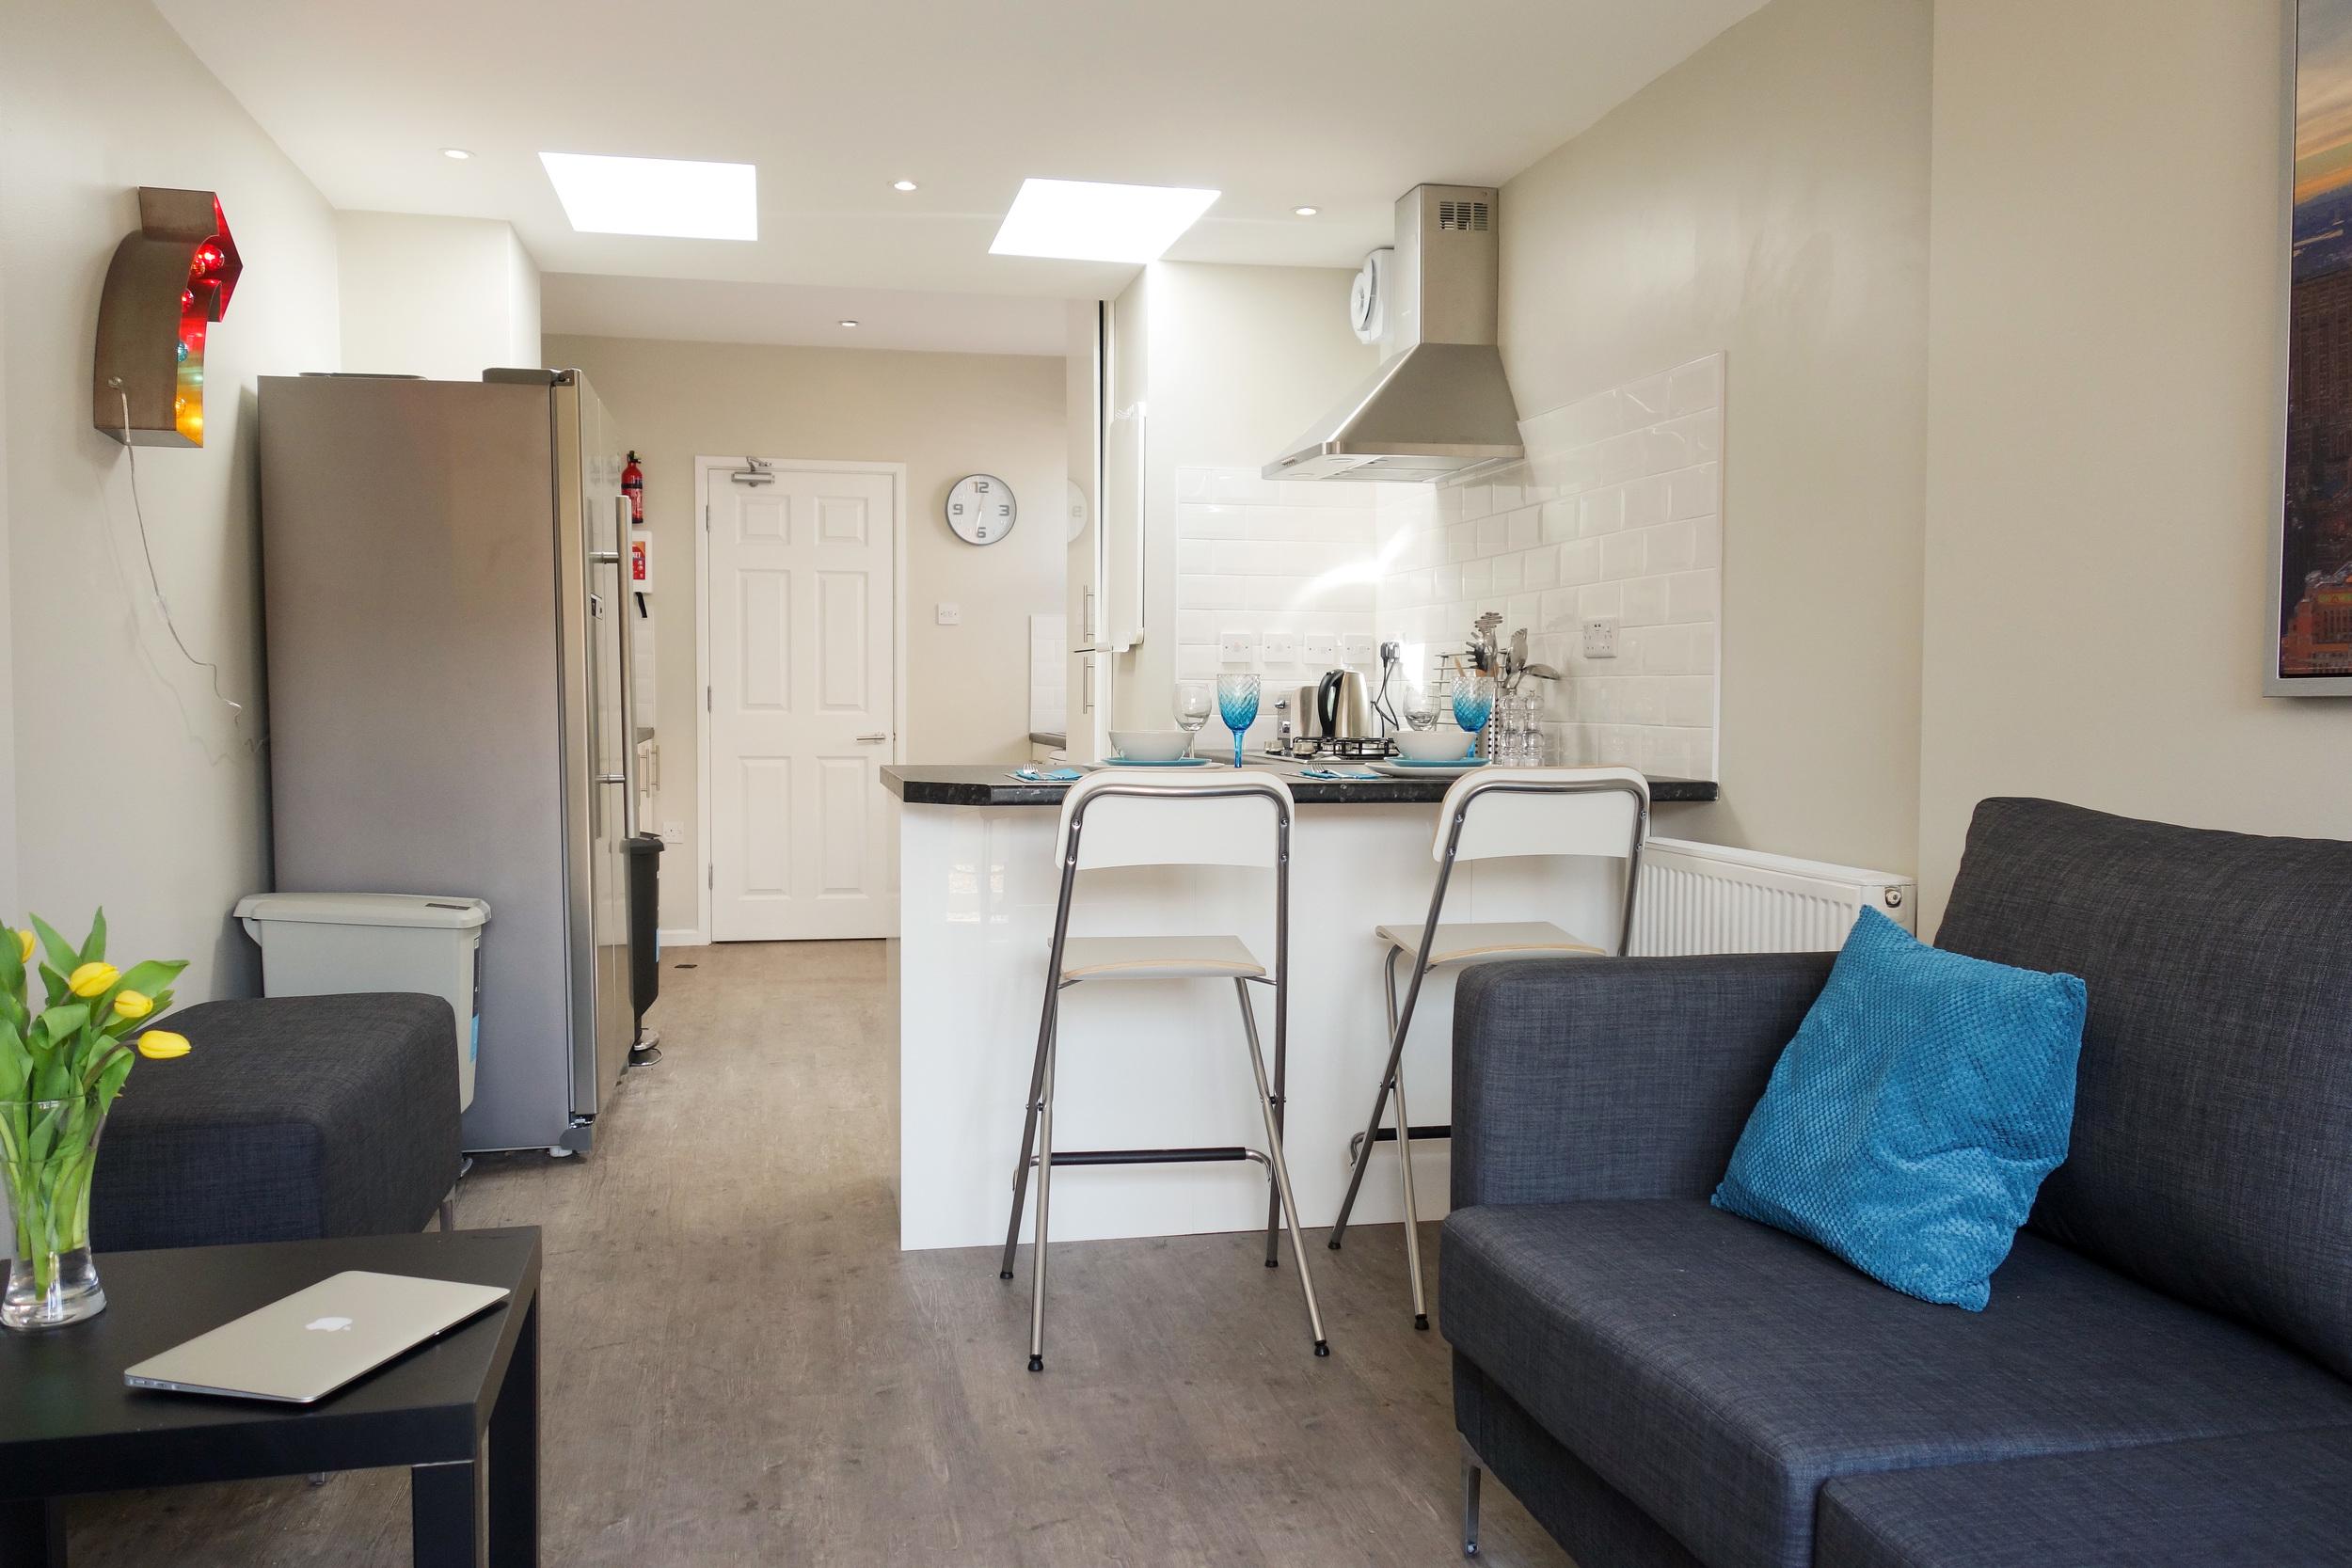 H1 Open Plan Kitchen Living Space.jpg